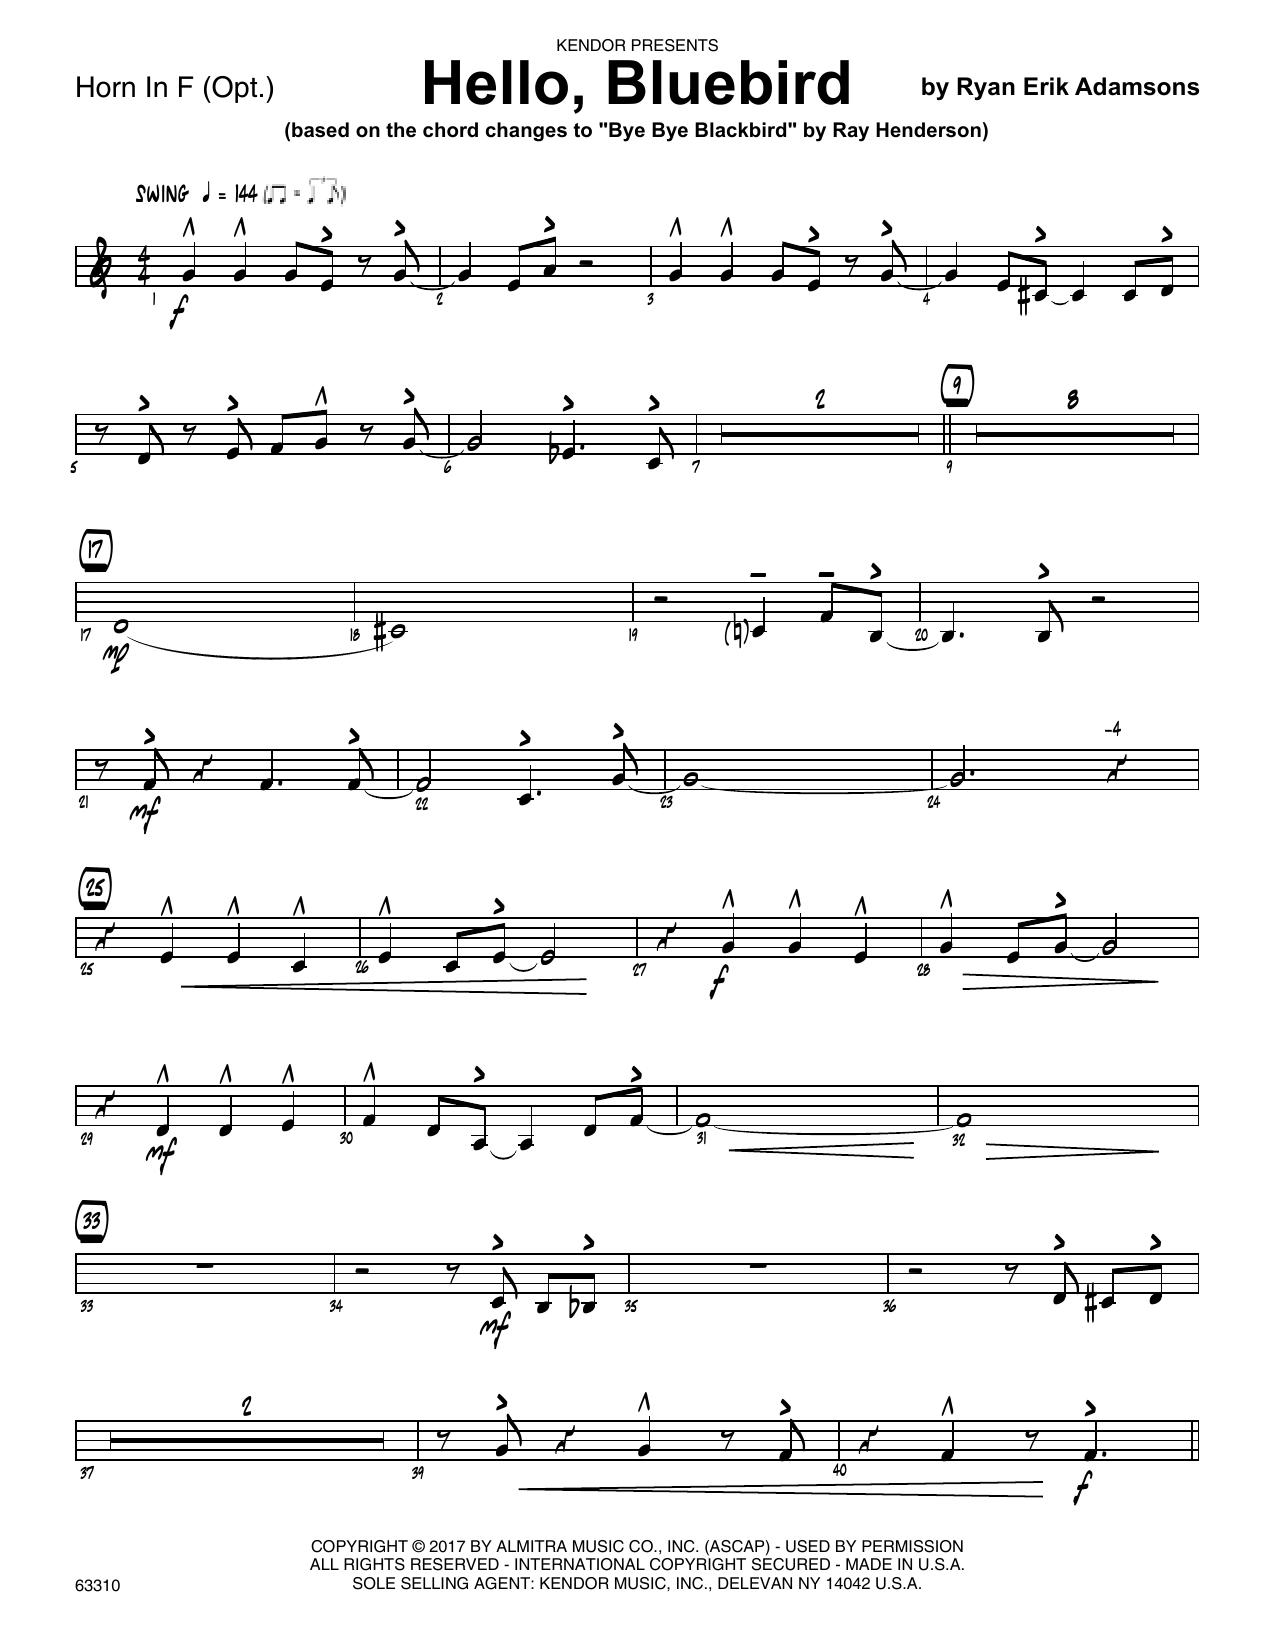 Ryan Erik Adamsons Hello, Bluebird (based on Bye Bye Blackbird) - Horn in F sheet music notes printable PDF score